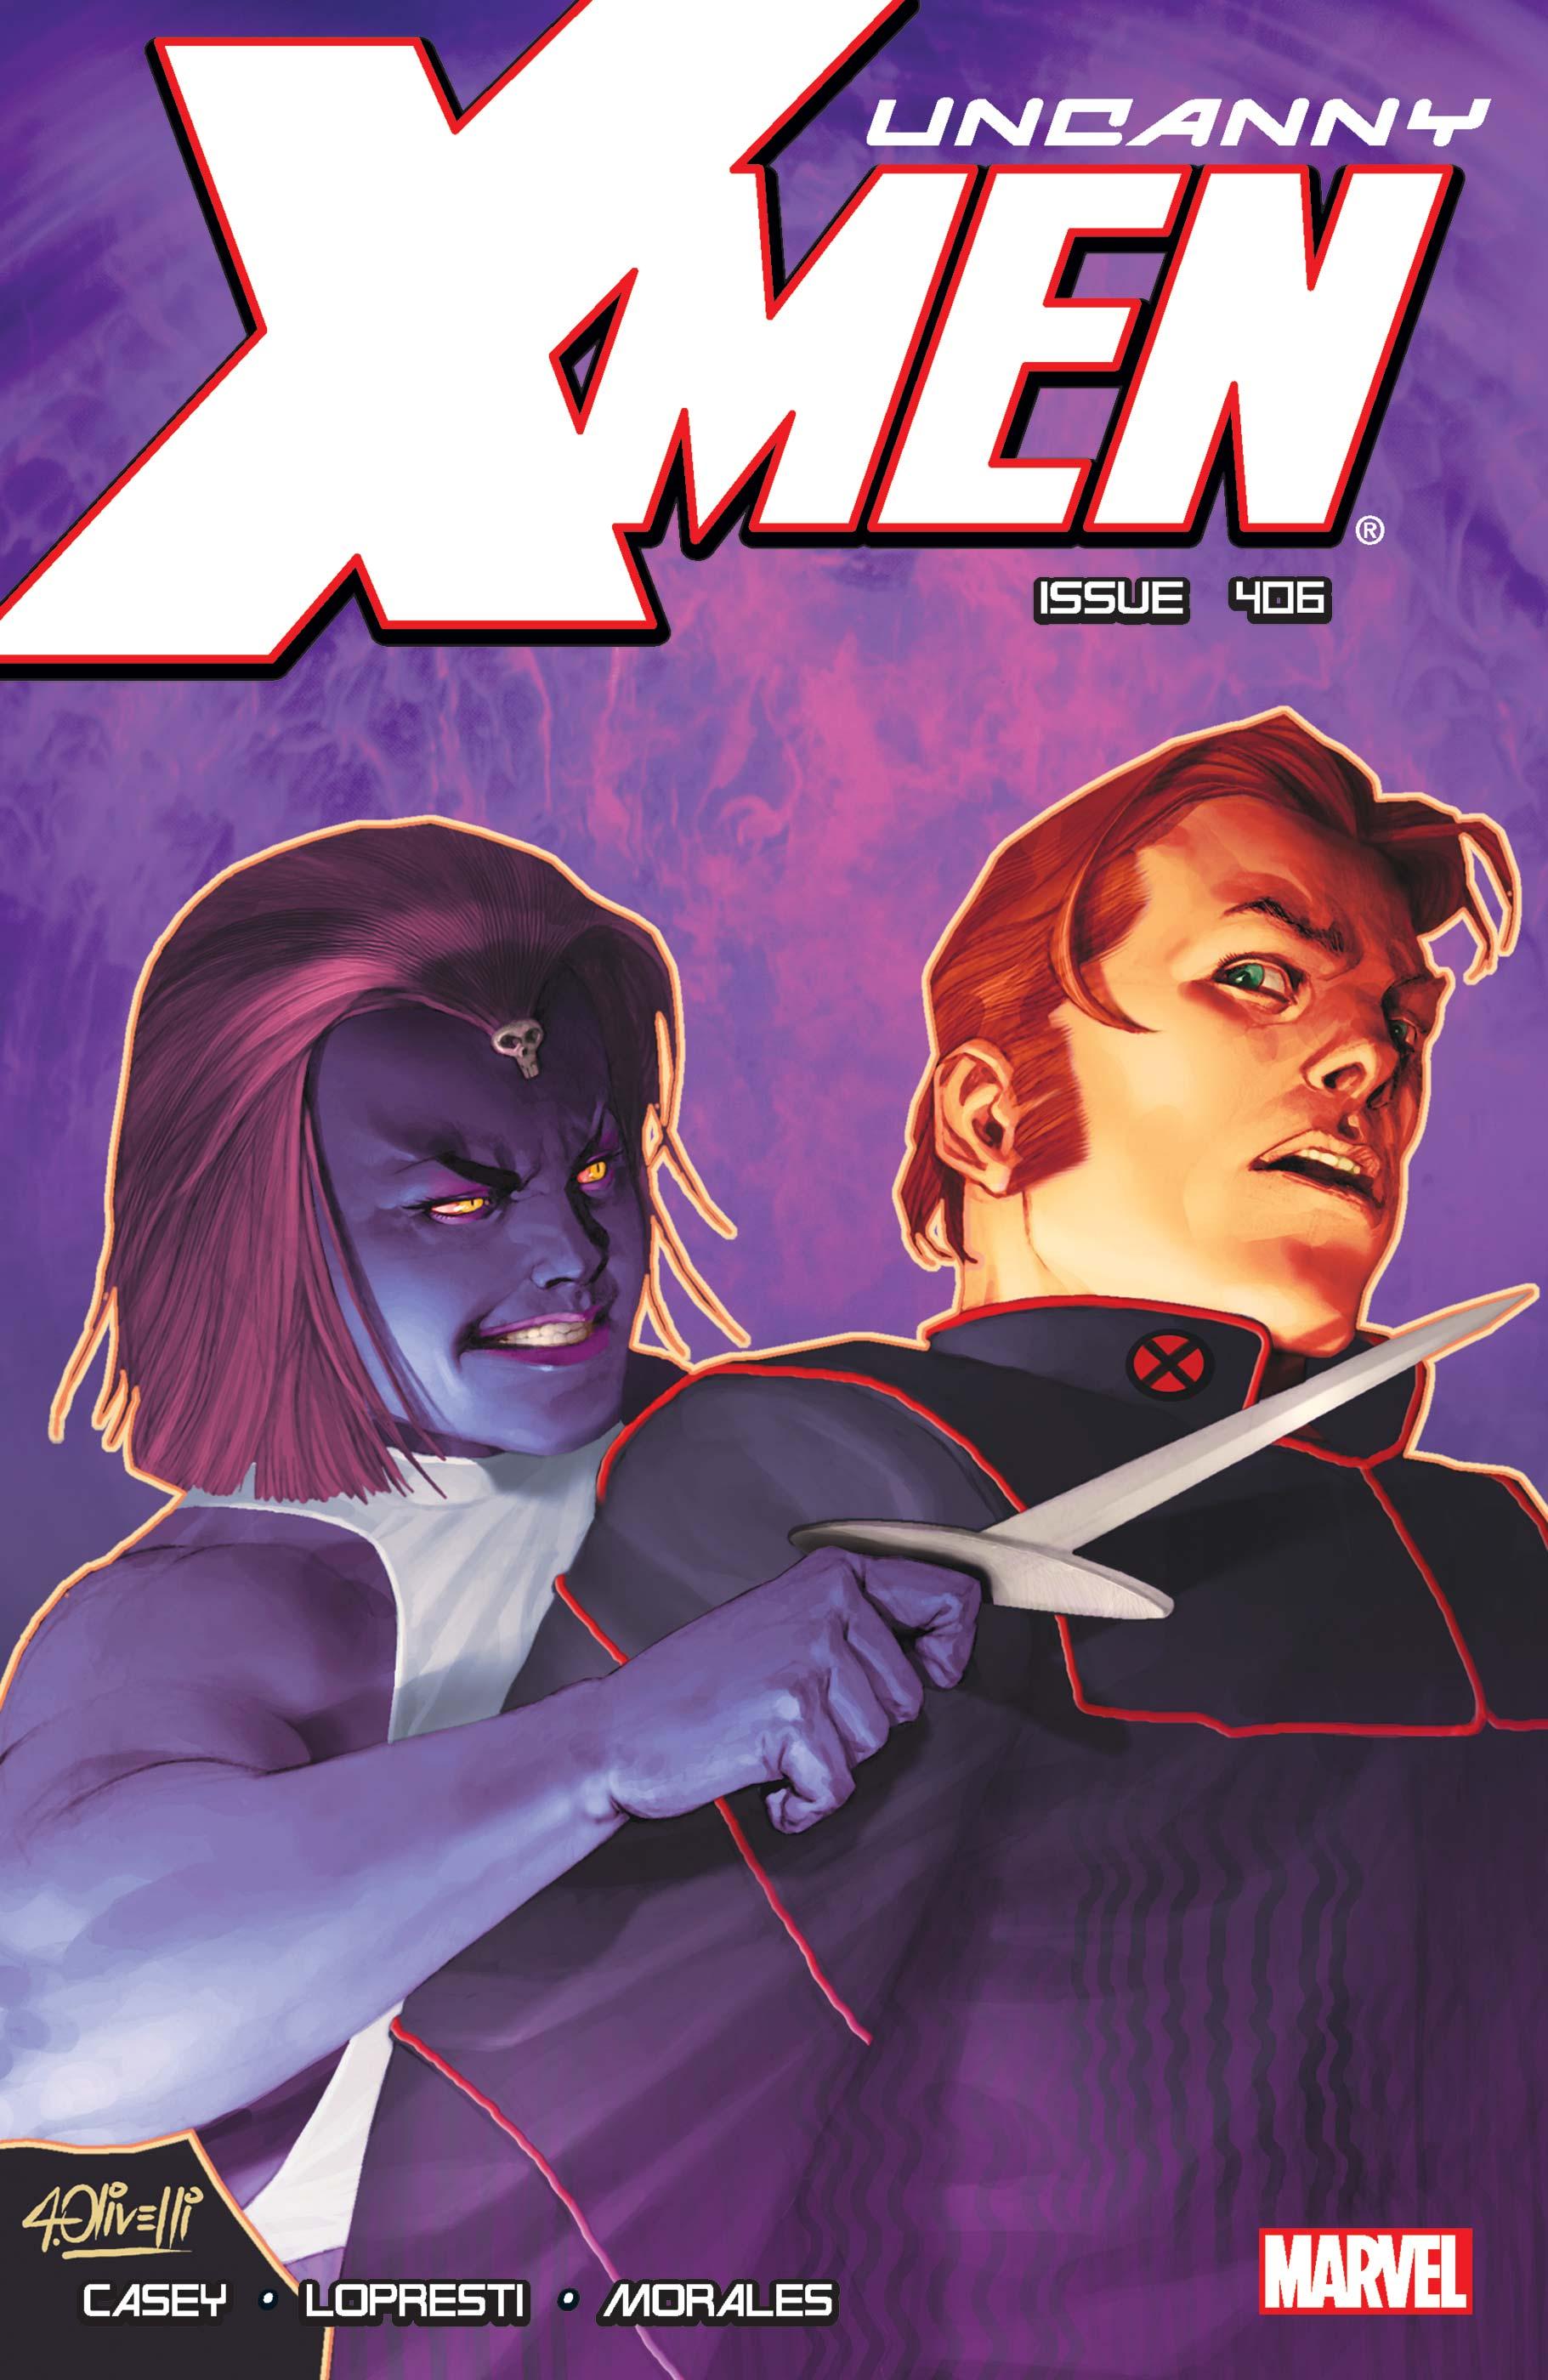 Uncanny X-Men (1963) #406